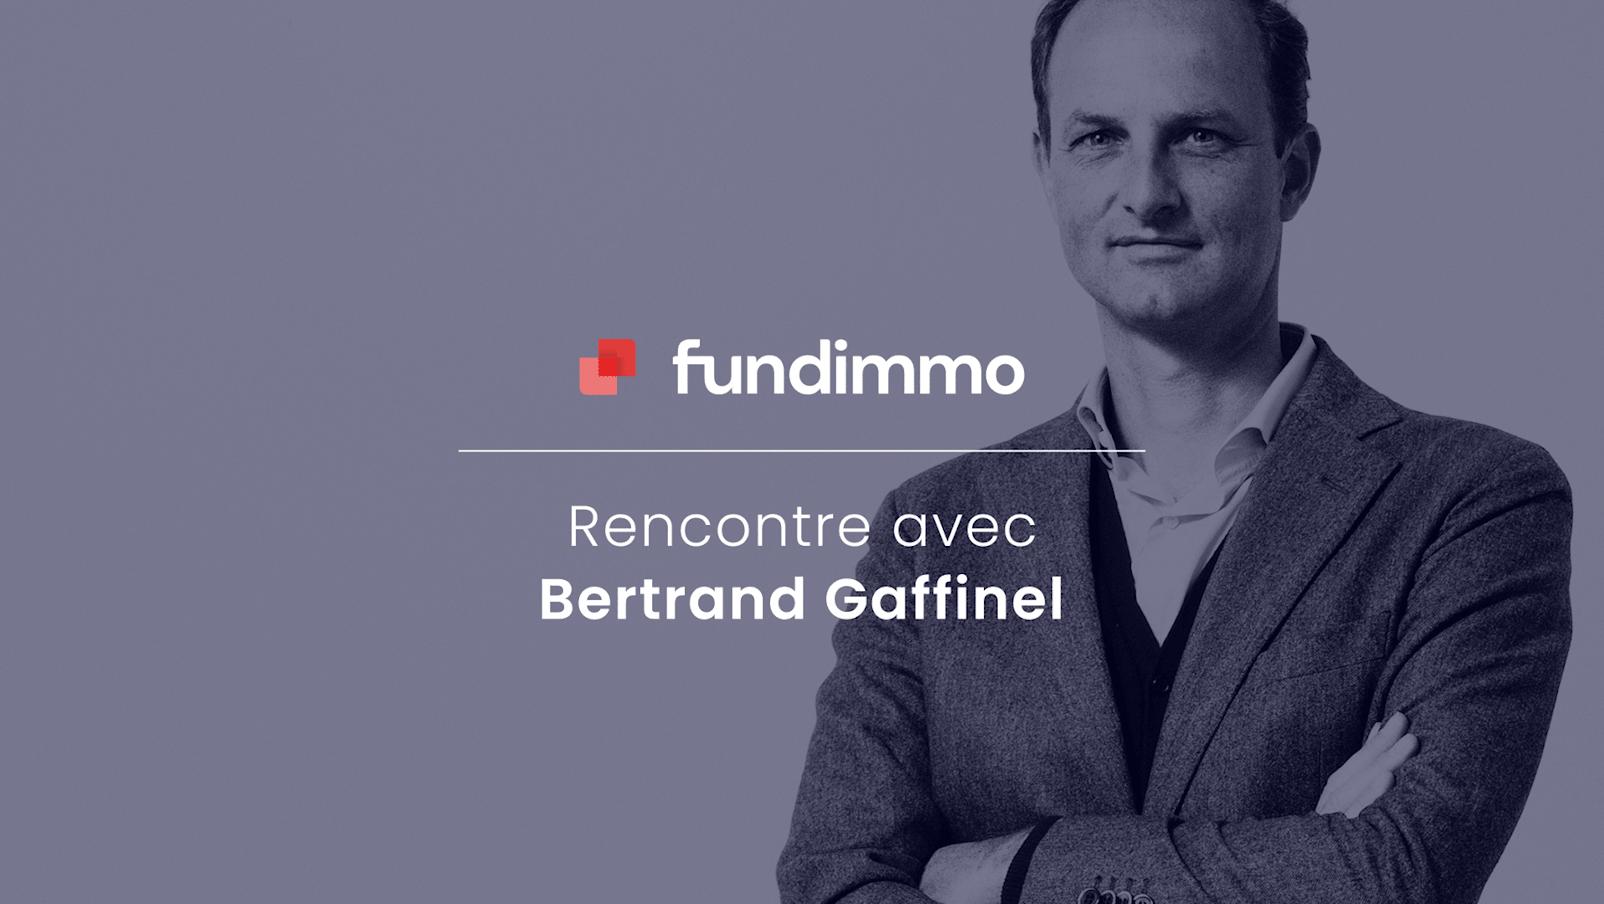 Rencontre avec Bertrand Gaffinel